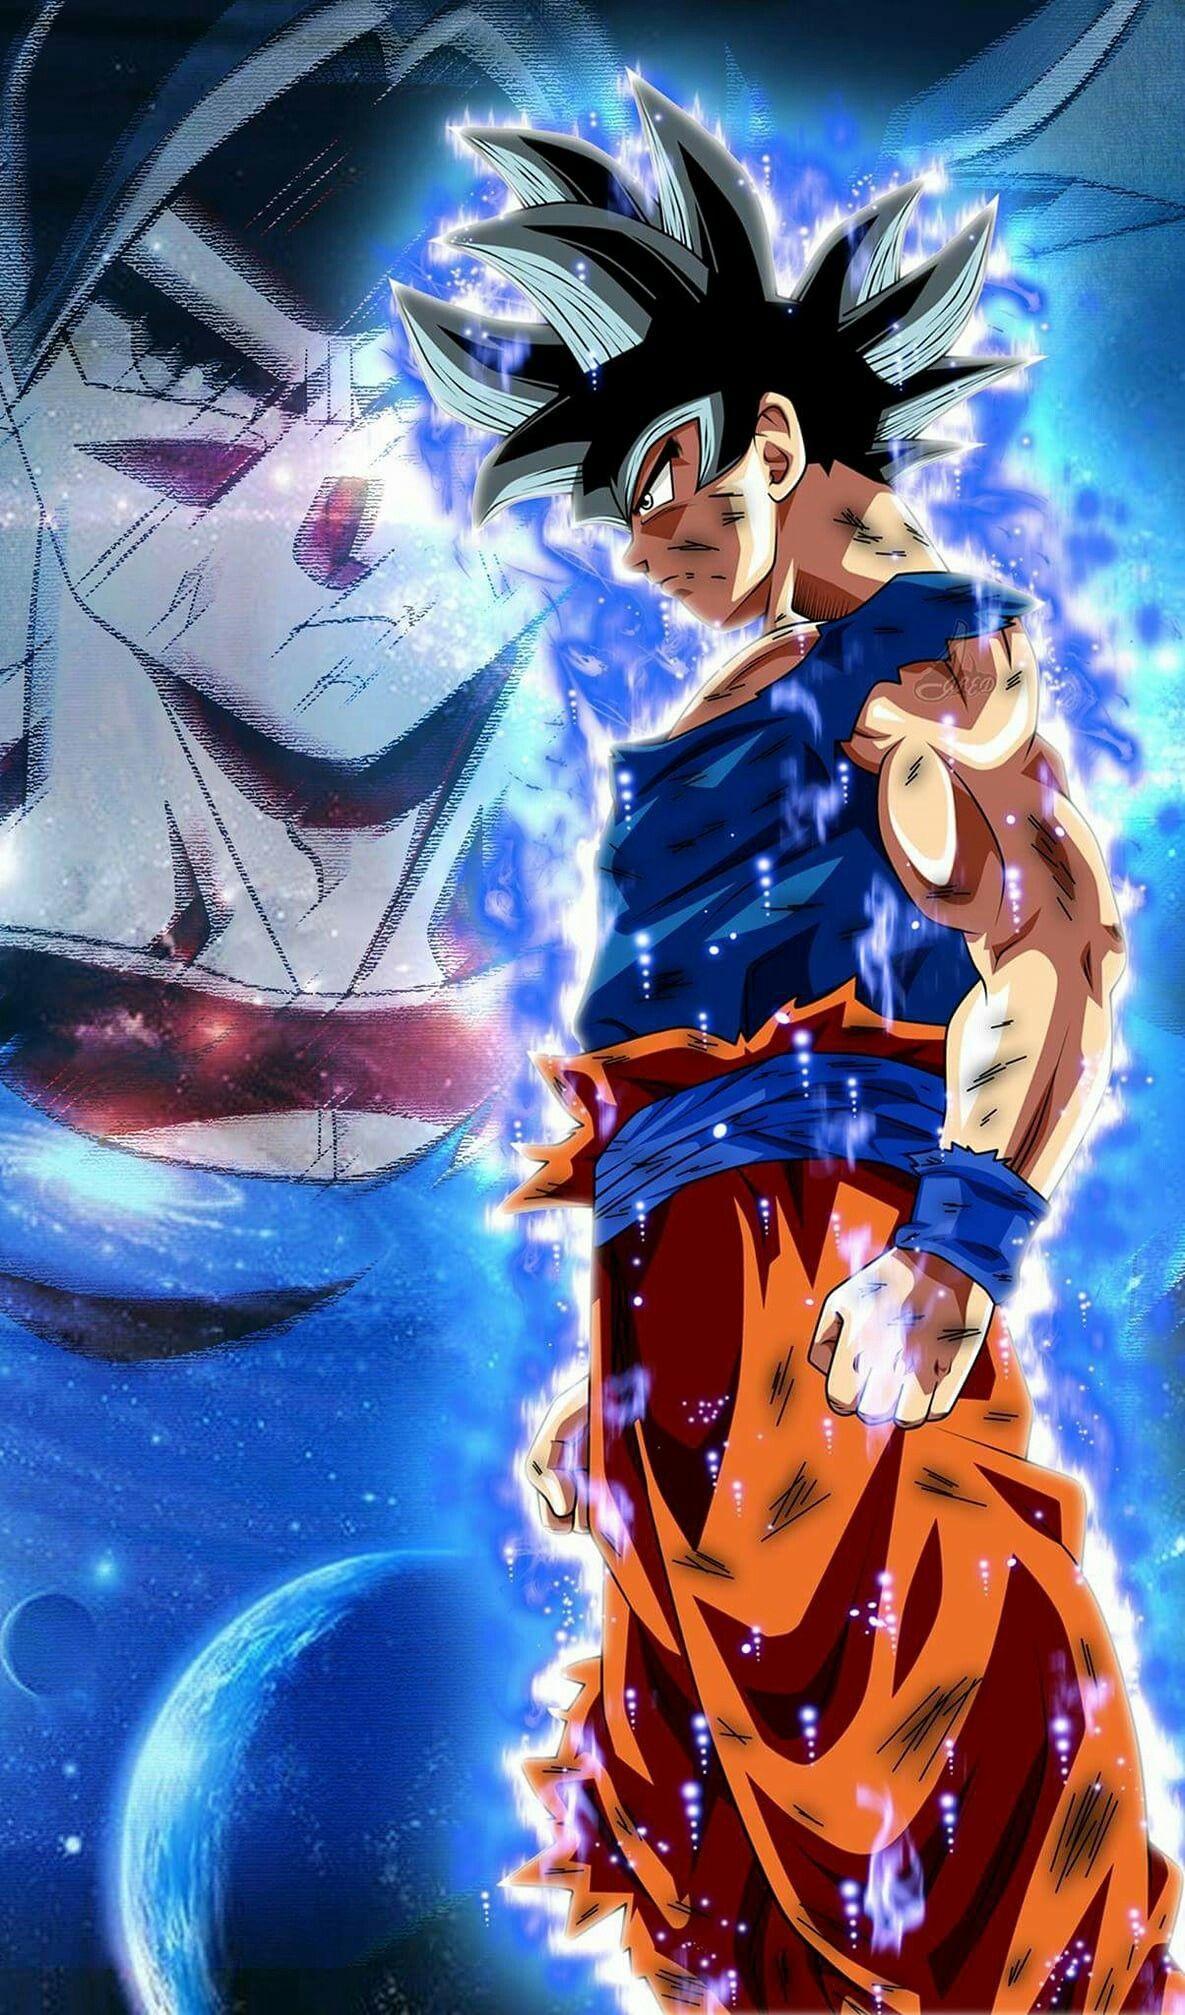 Goku HD Wallpaper - Ultra instinct goku for Android - APK ...